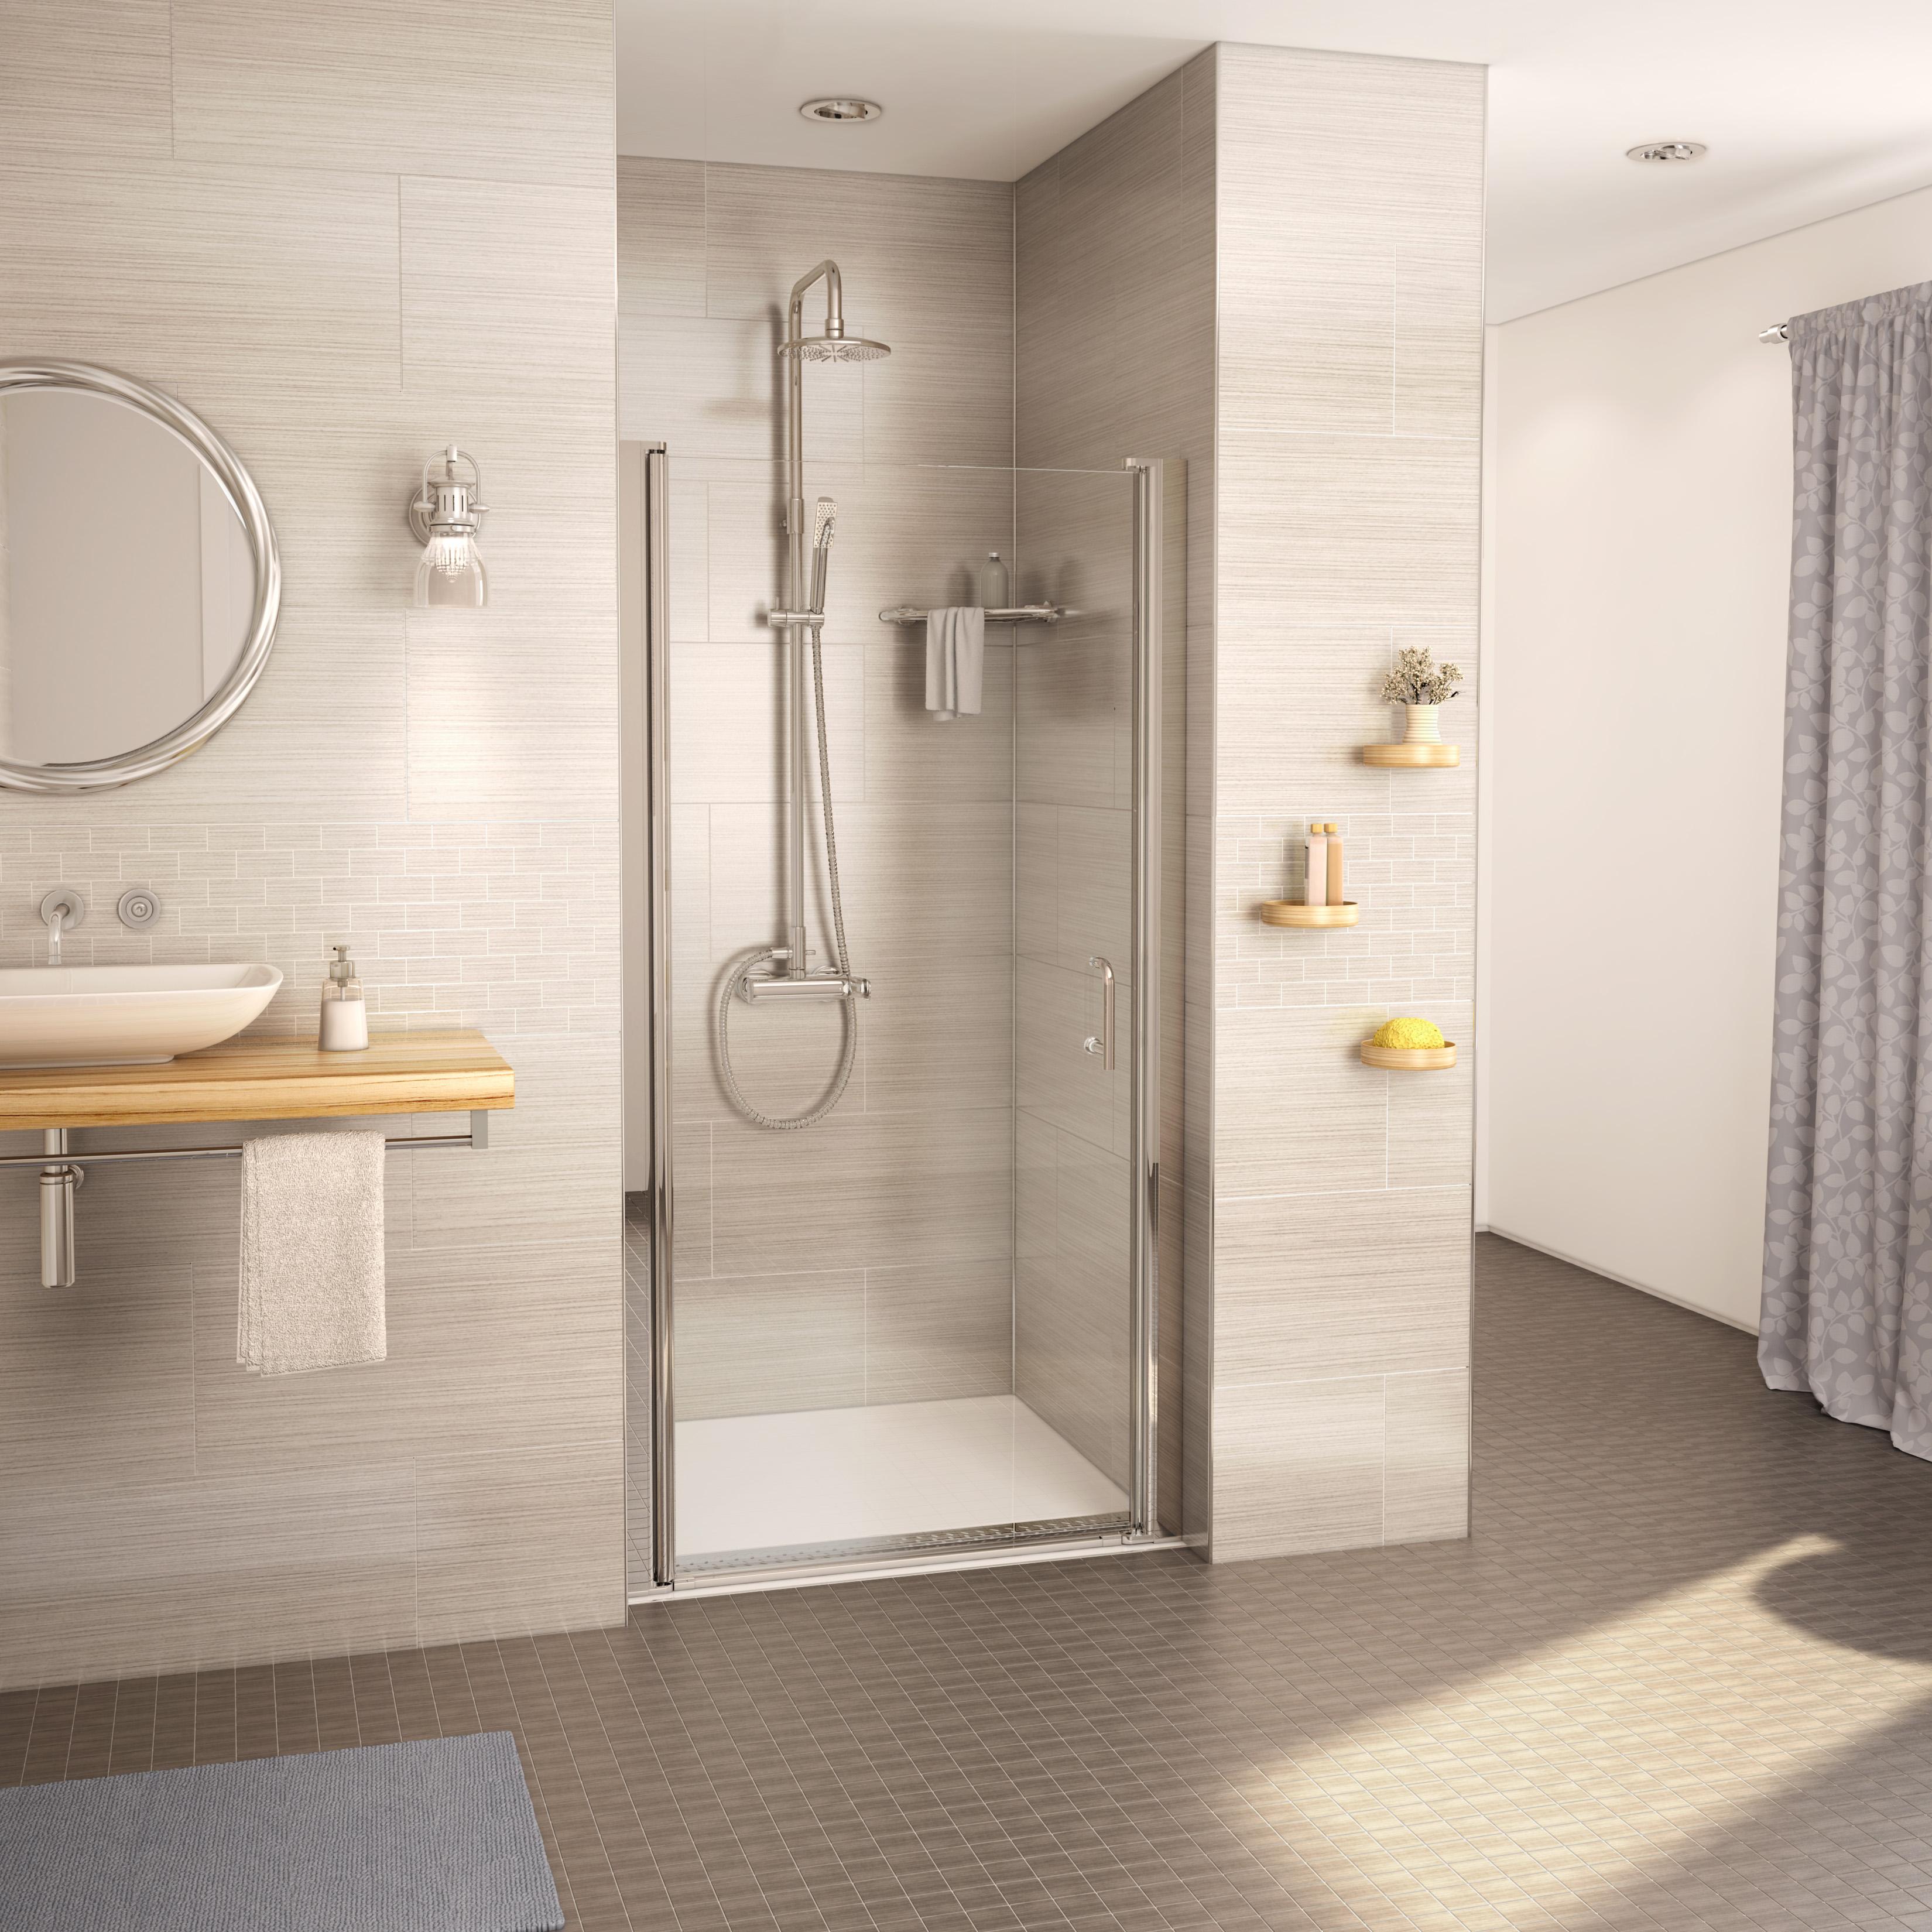 size sofa showerloor drain astounding shower corner floor inspirations pan full of installation tile picture pansor ceramic